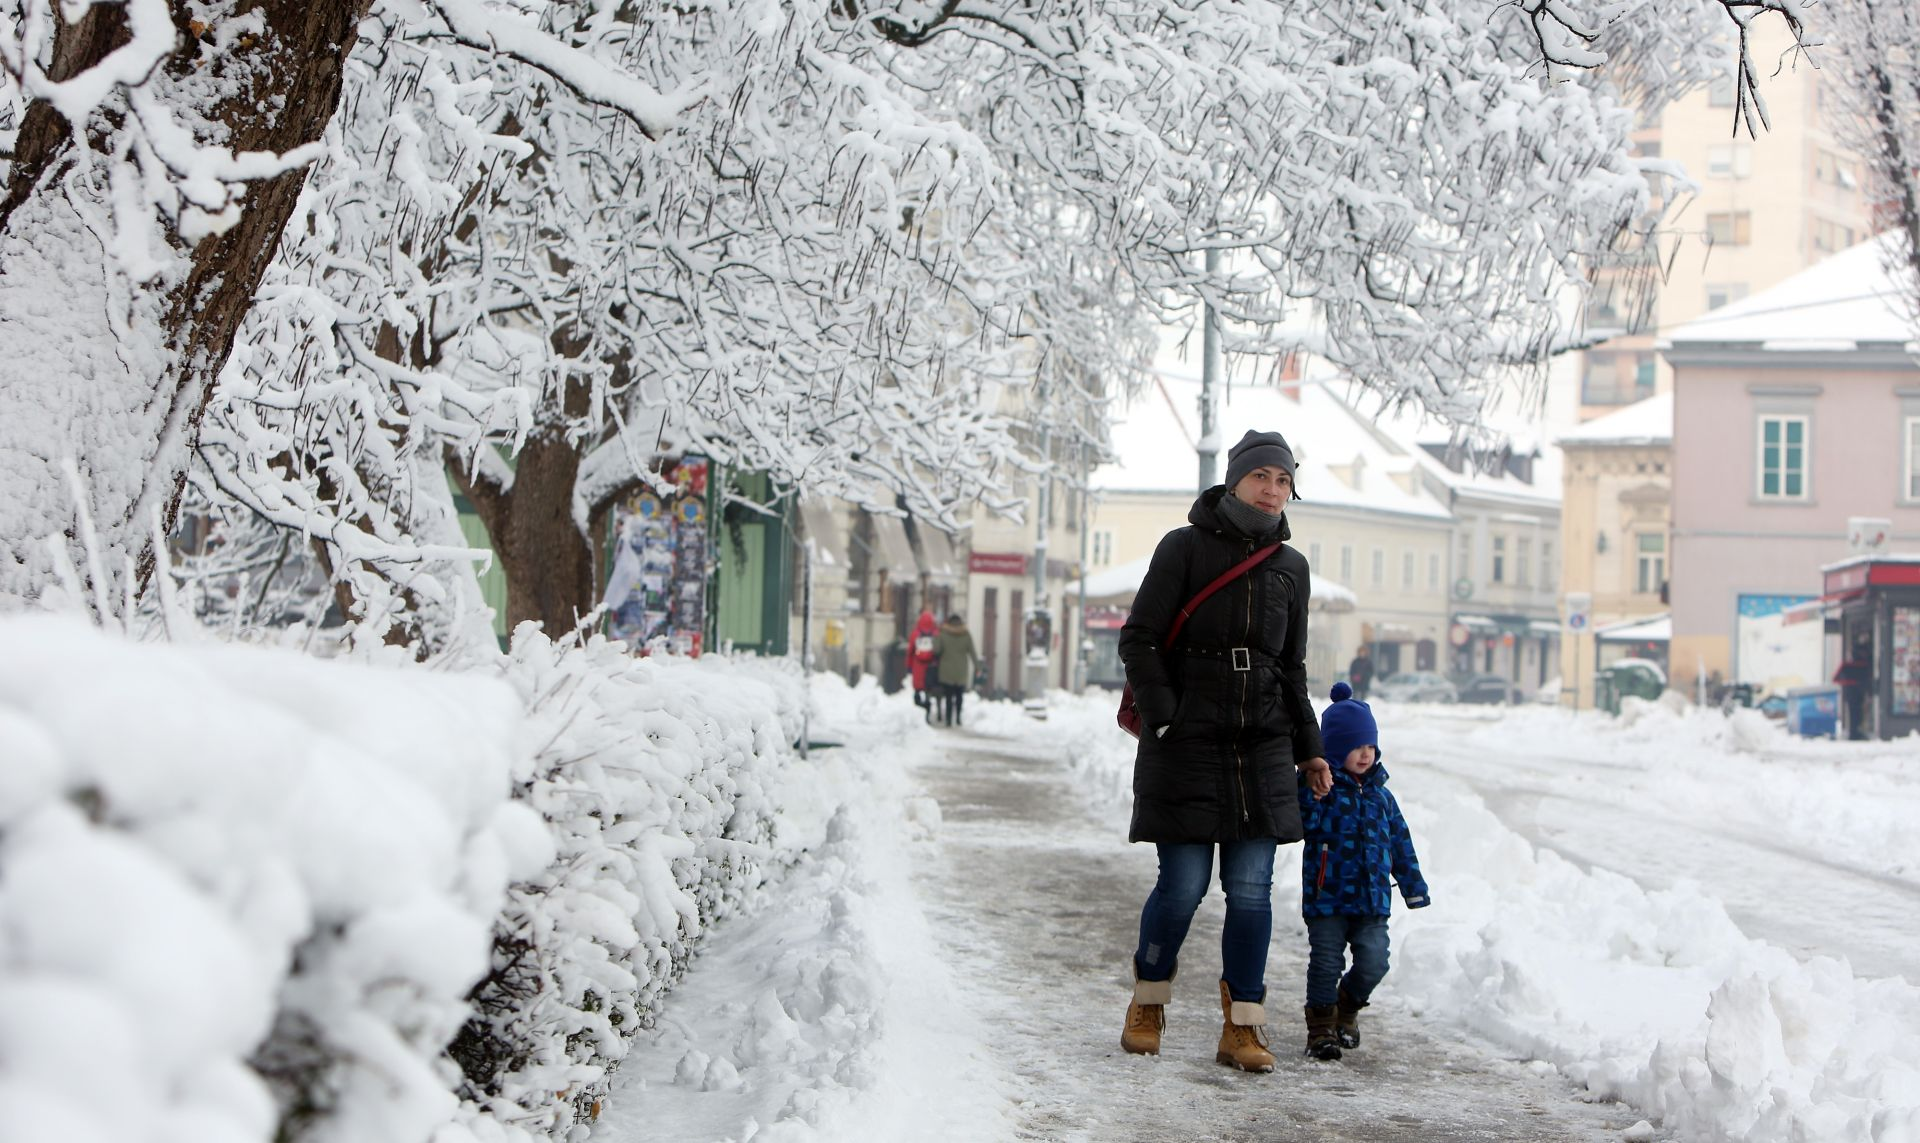 VIDEO: Snježne radosti na snijegu i tvrdome ledu